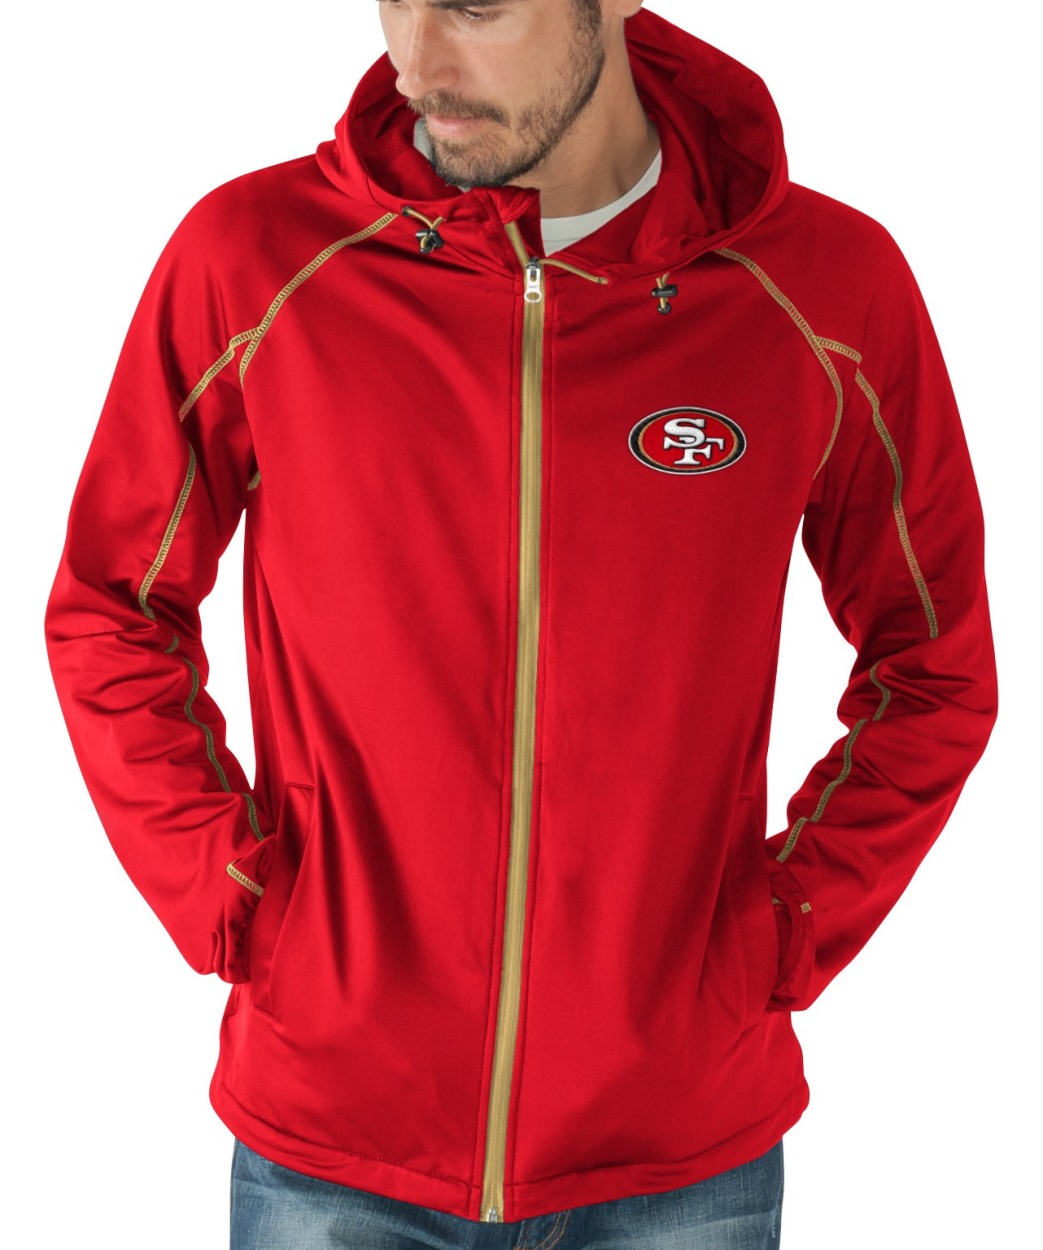 "San Francisco 49ers NFL G-III ""Resistance"" Full Zip Hooded Premium Men's Jacket by G-III Sports"